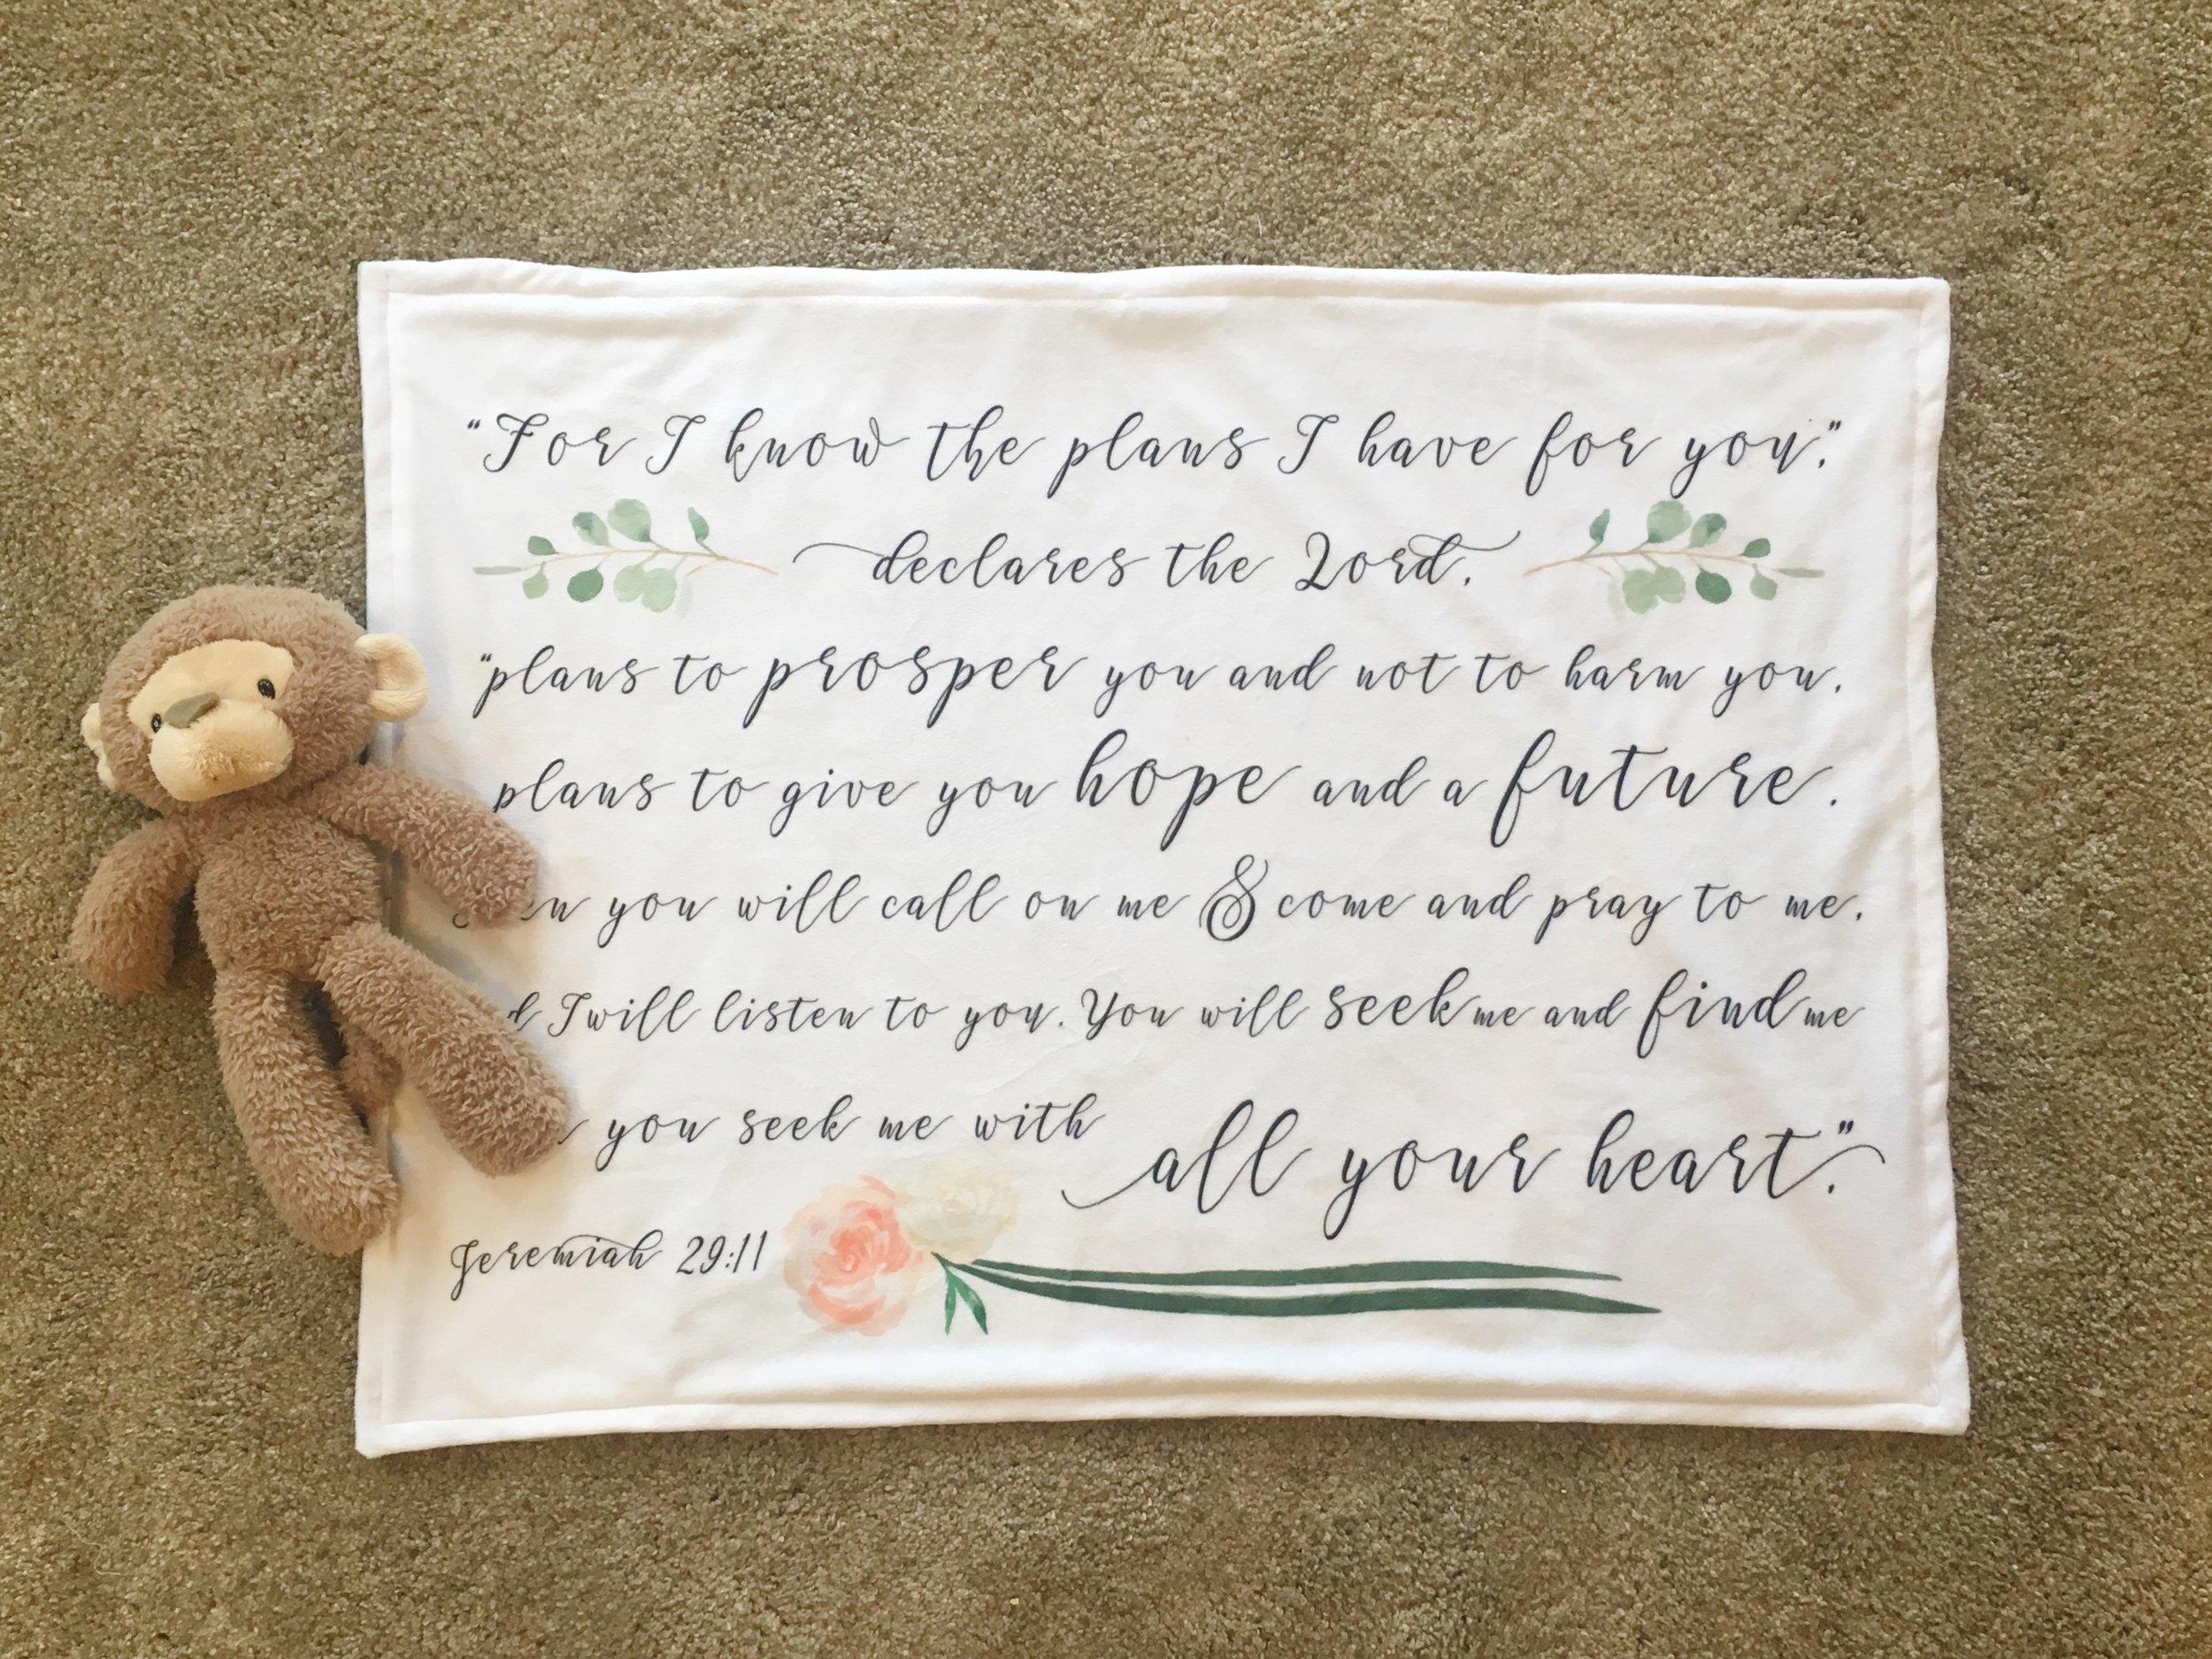 Central PA, Baby Blanket, Hand lettered, JesSmith Designs, Invitations, custom-04-22 10.00.16.jpg